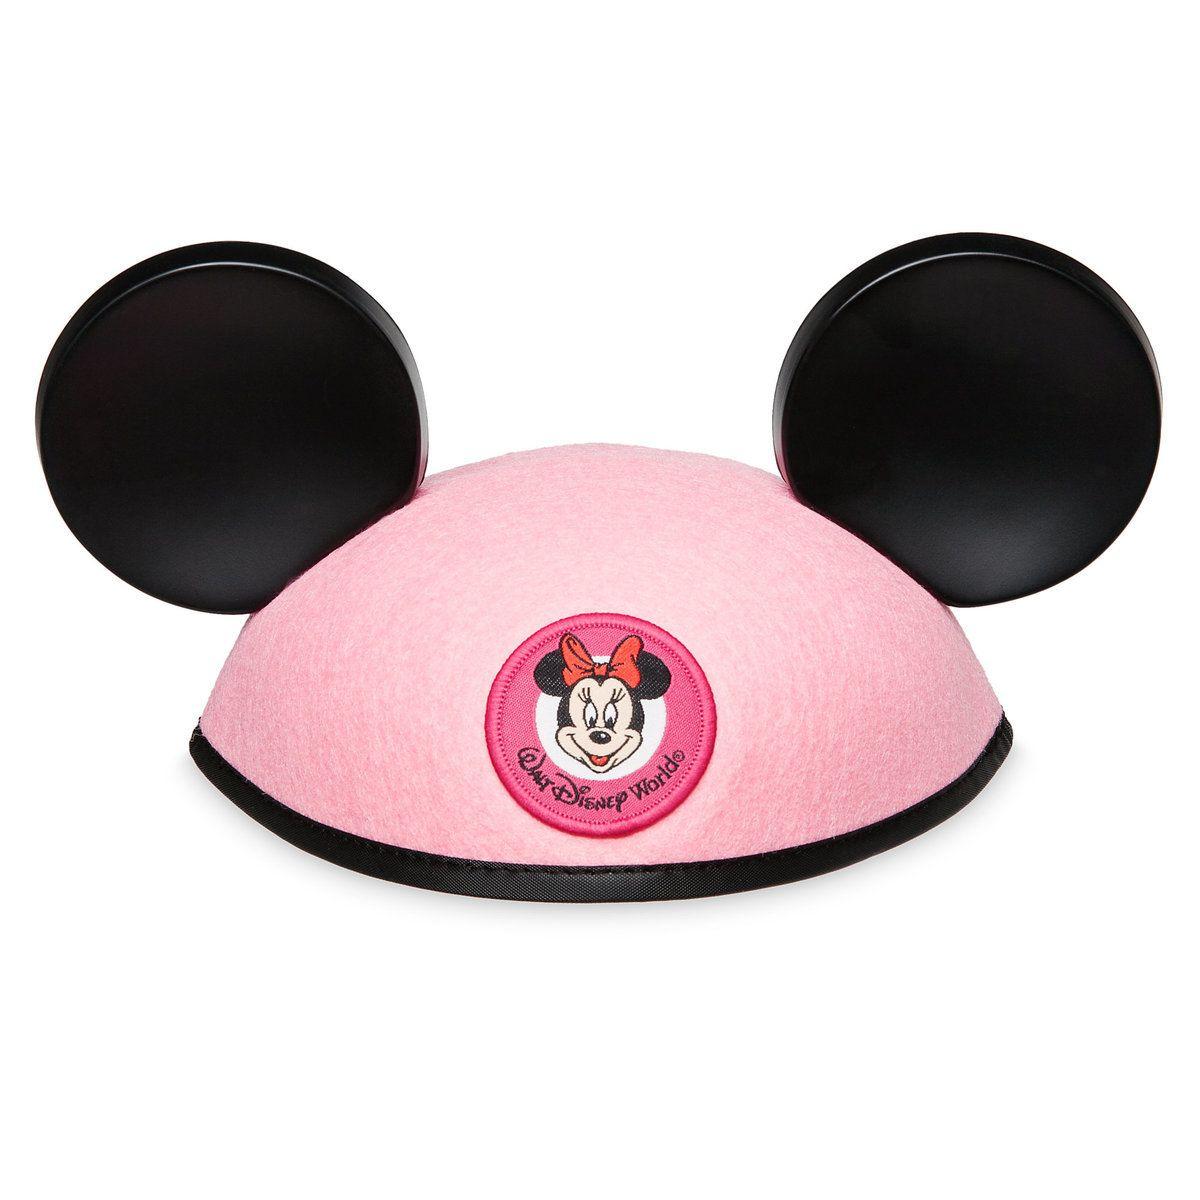 Minnie Mouse Ear Hat for Baby - Walt Disney World  cc4e6993a01